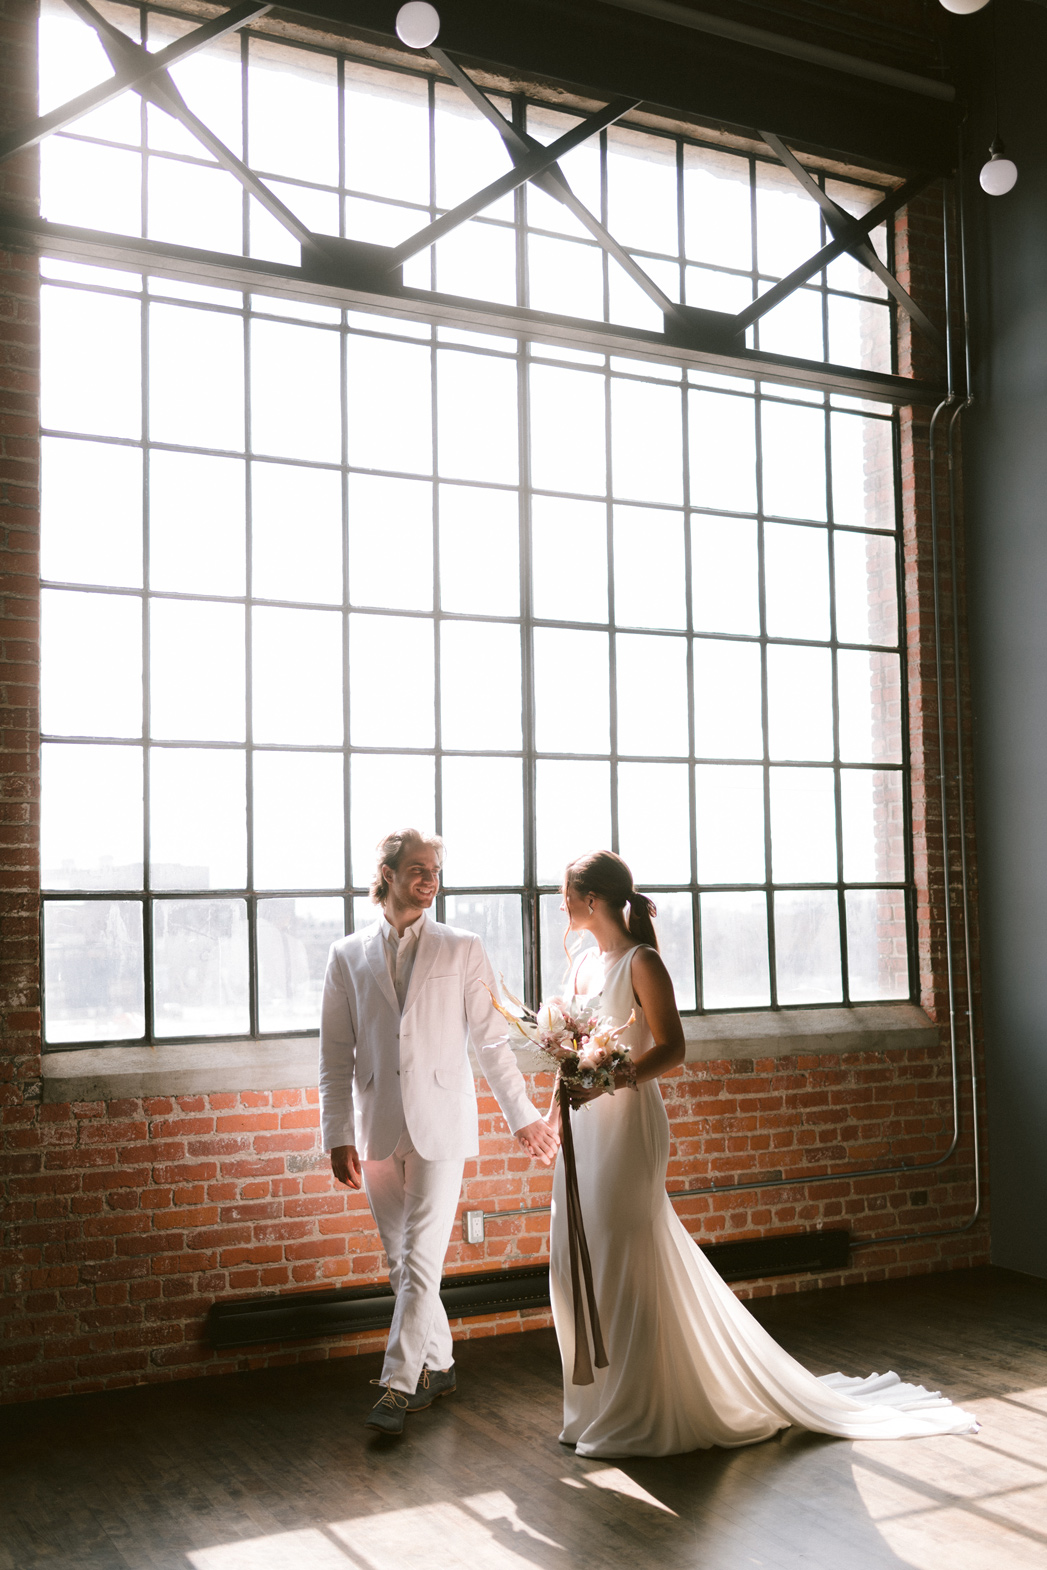 Bride and Groom in a Bright Loft